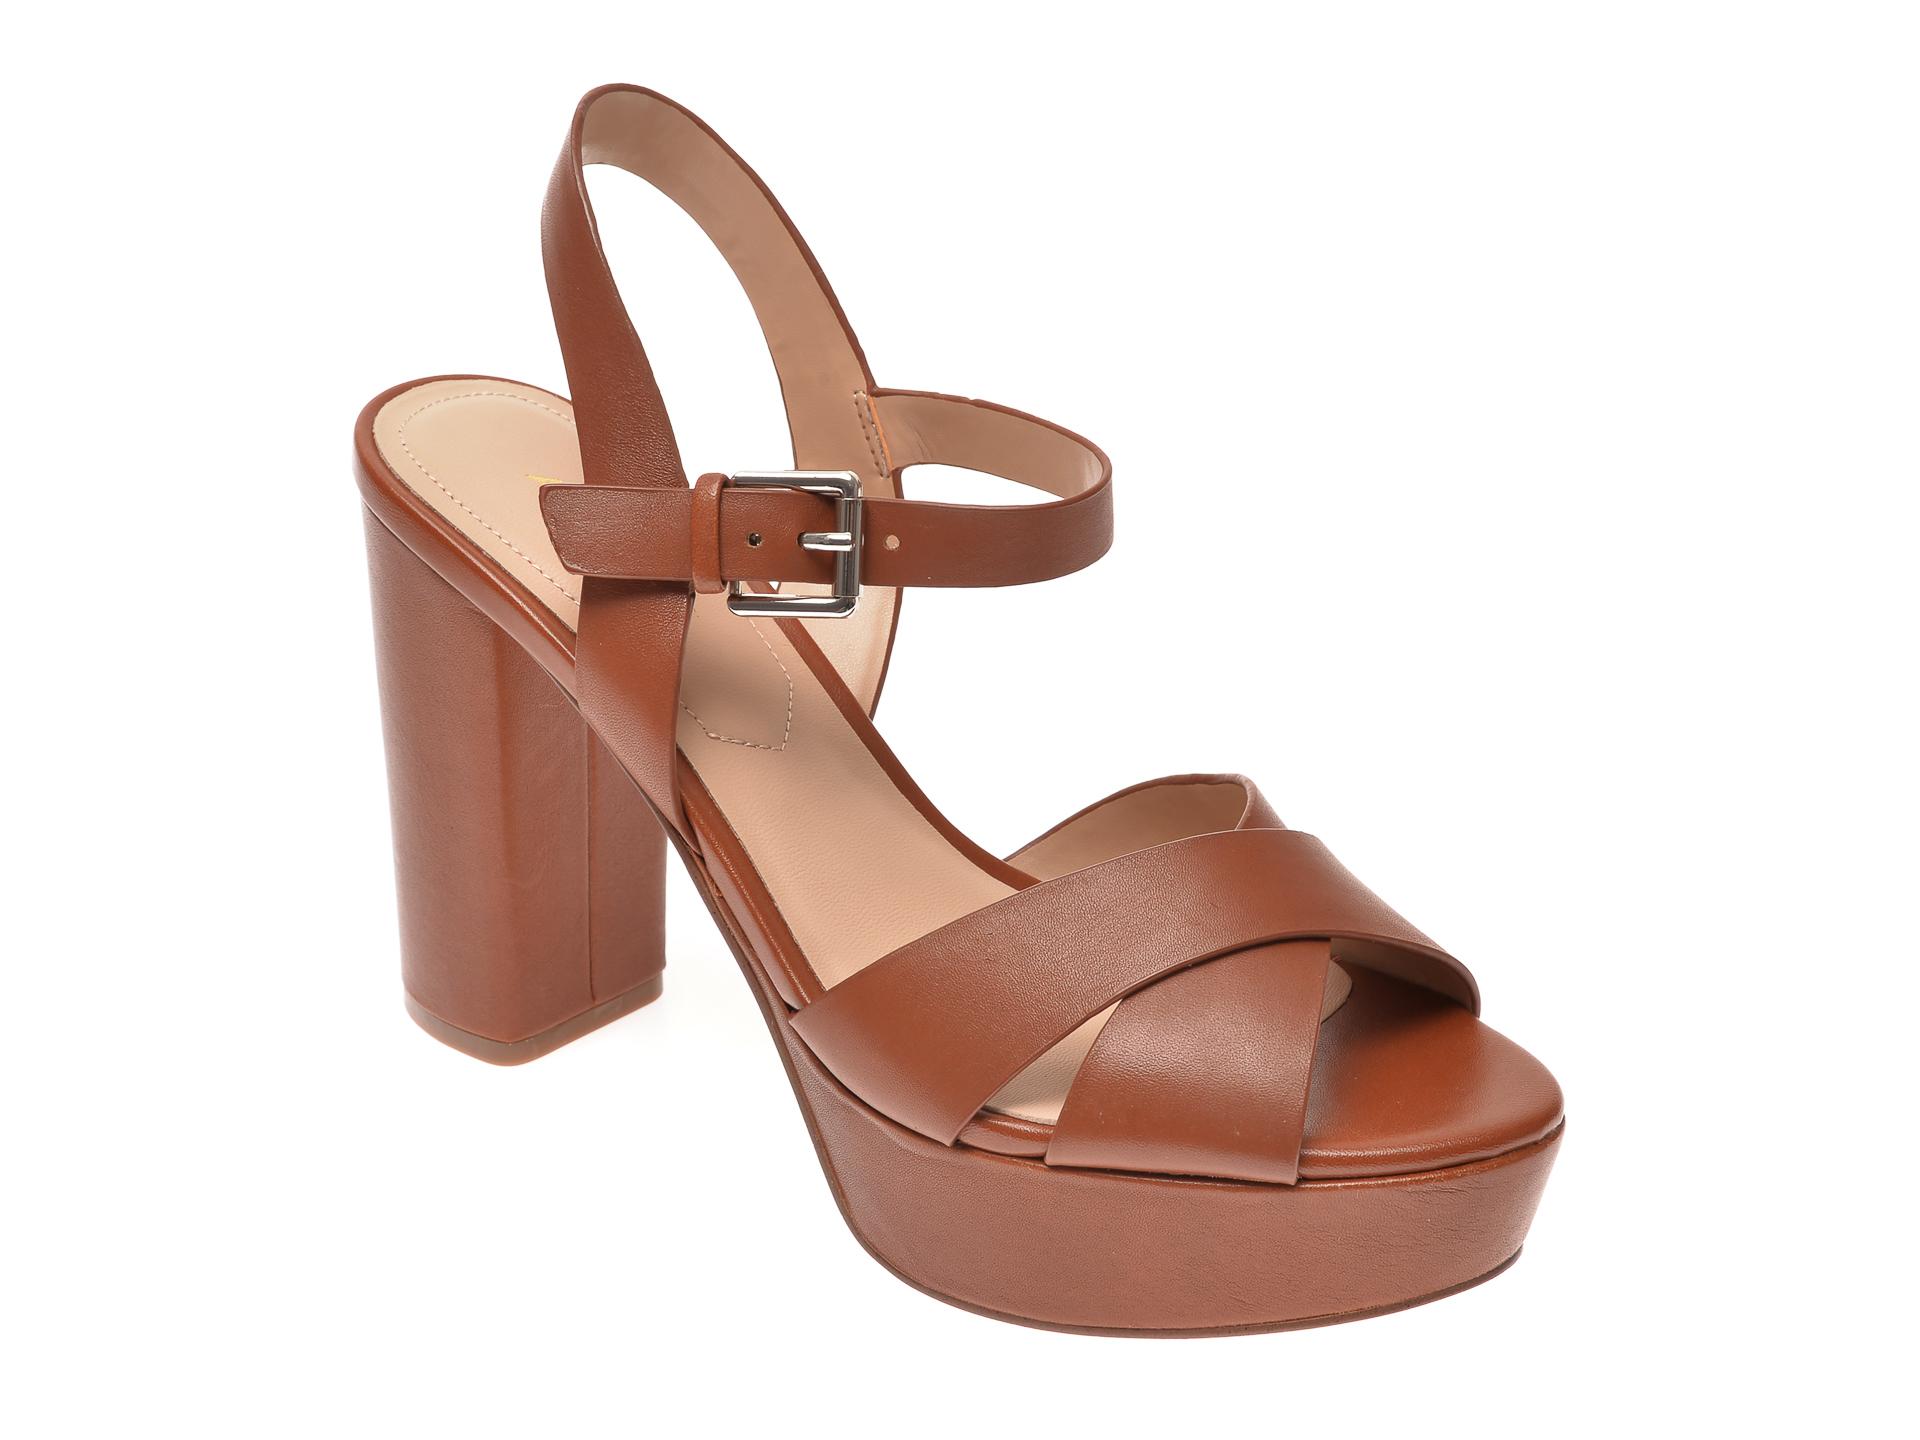 Sandale ALDO maro, Platina210, din piele naturala imagine